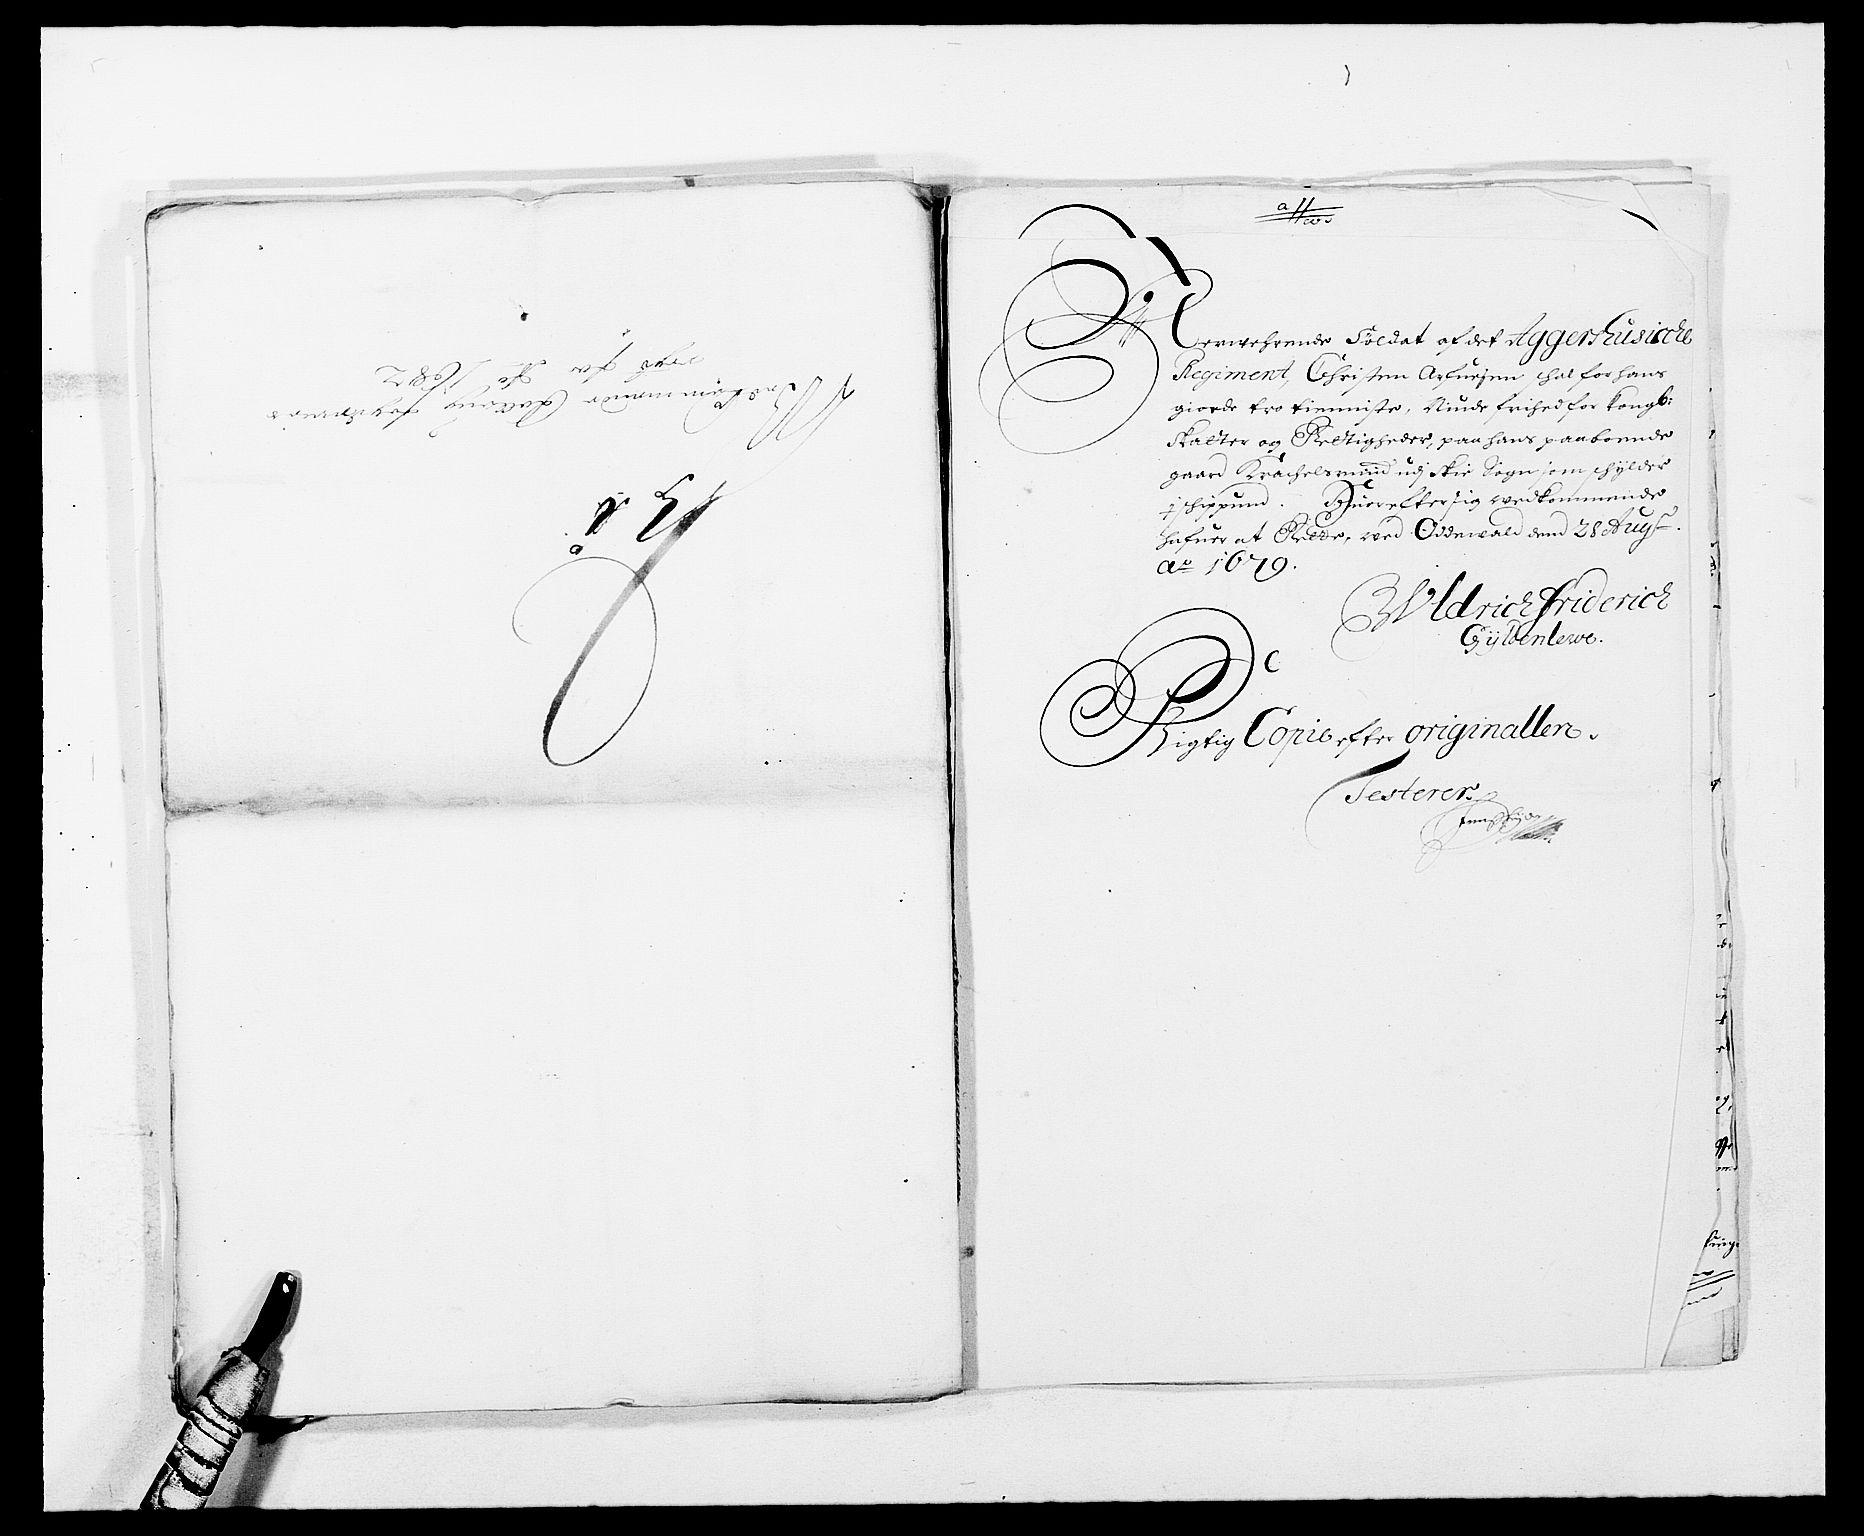 RA, Rentekammeret inntil 1814, Reviderte regnskaper, Fogderegnskap, R09/L0432: Fogderegnskap Follo, 1680-1684, s. 76